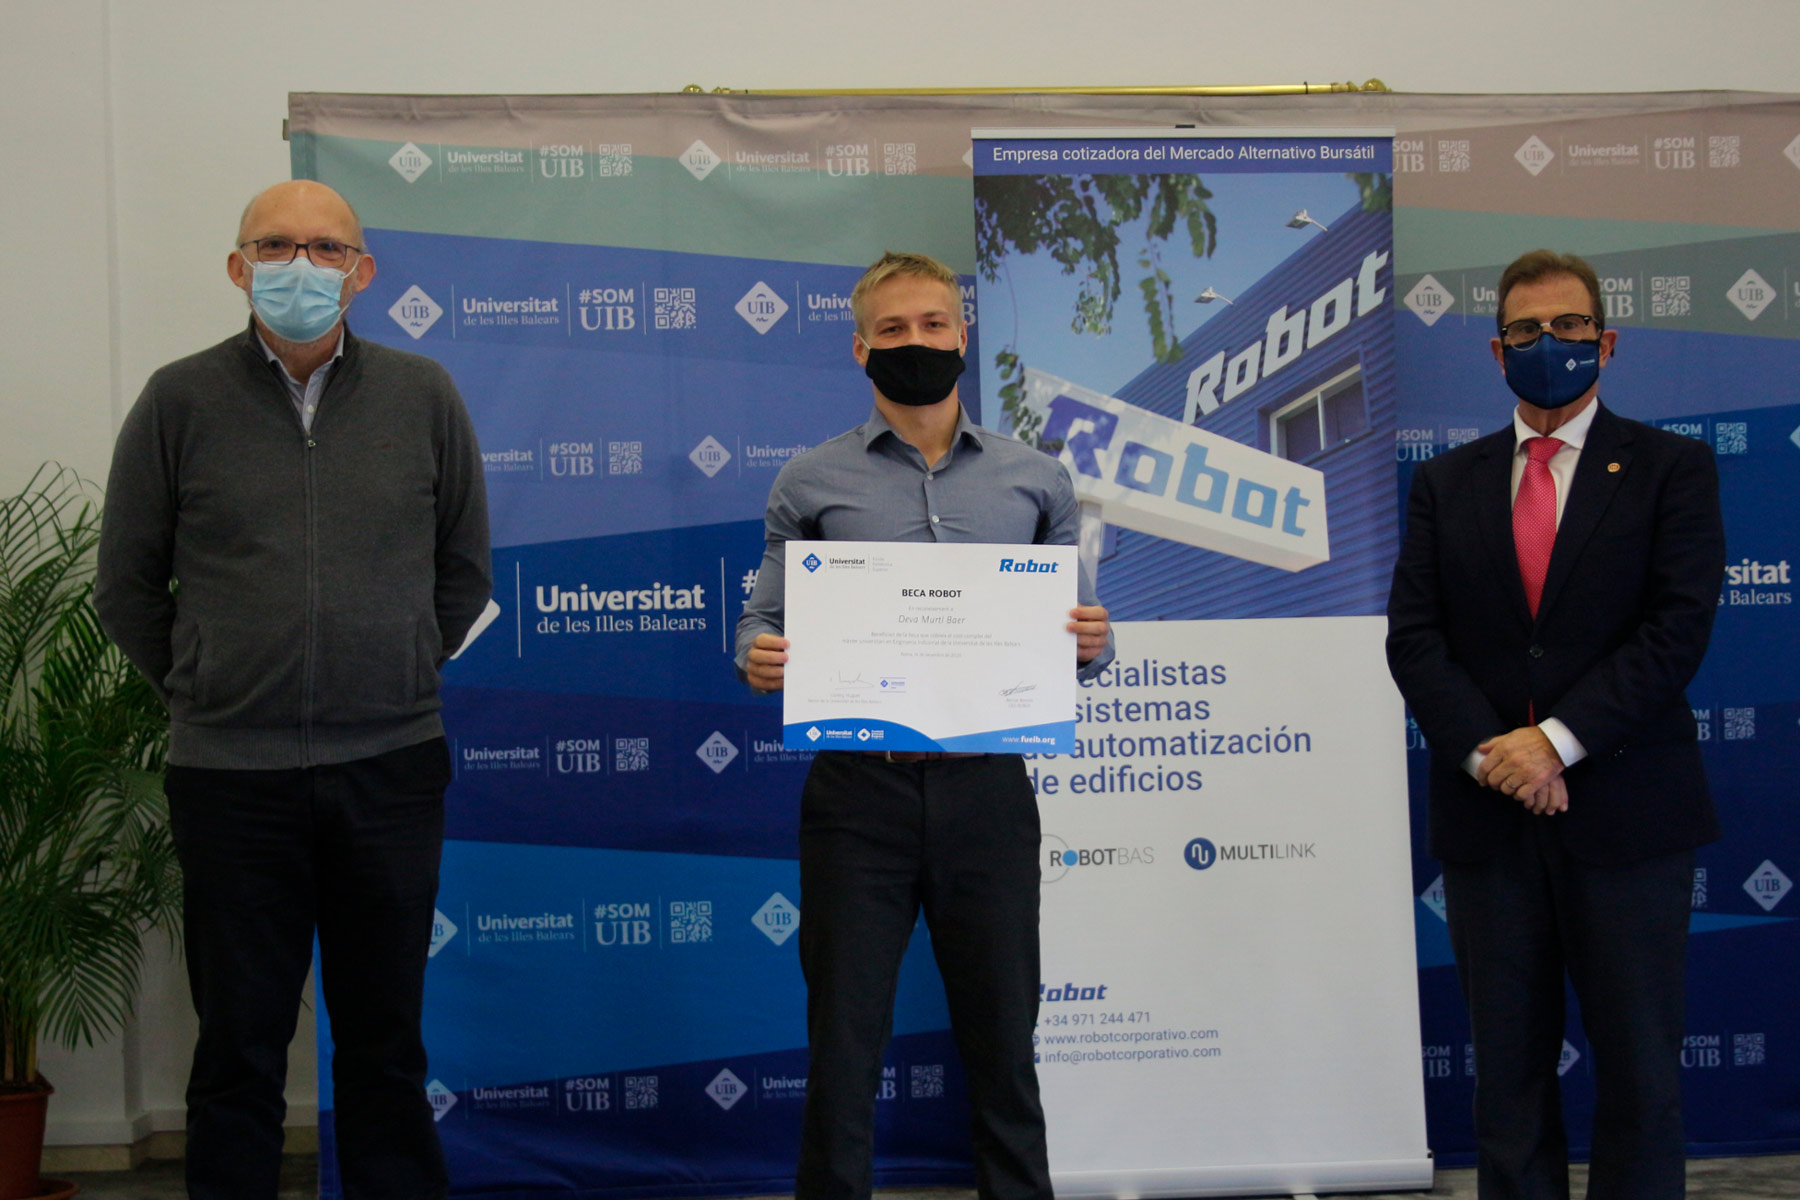 Deva Murtí, winner of the II edition of the Robot Scholarship